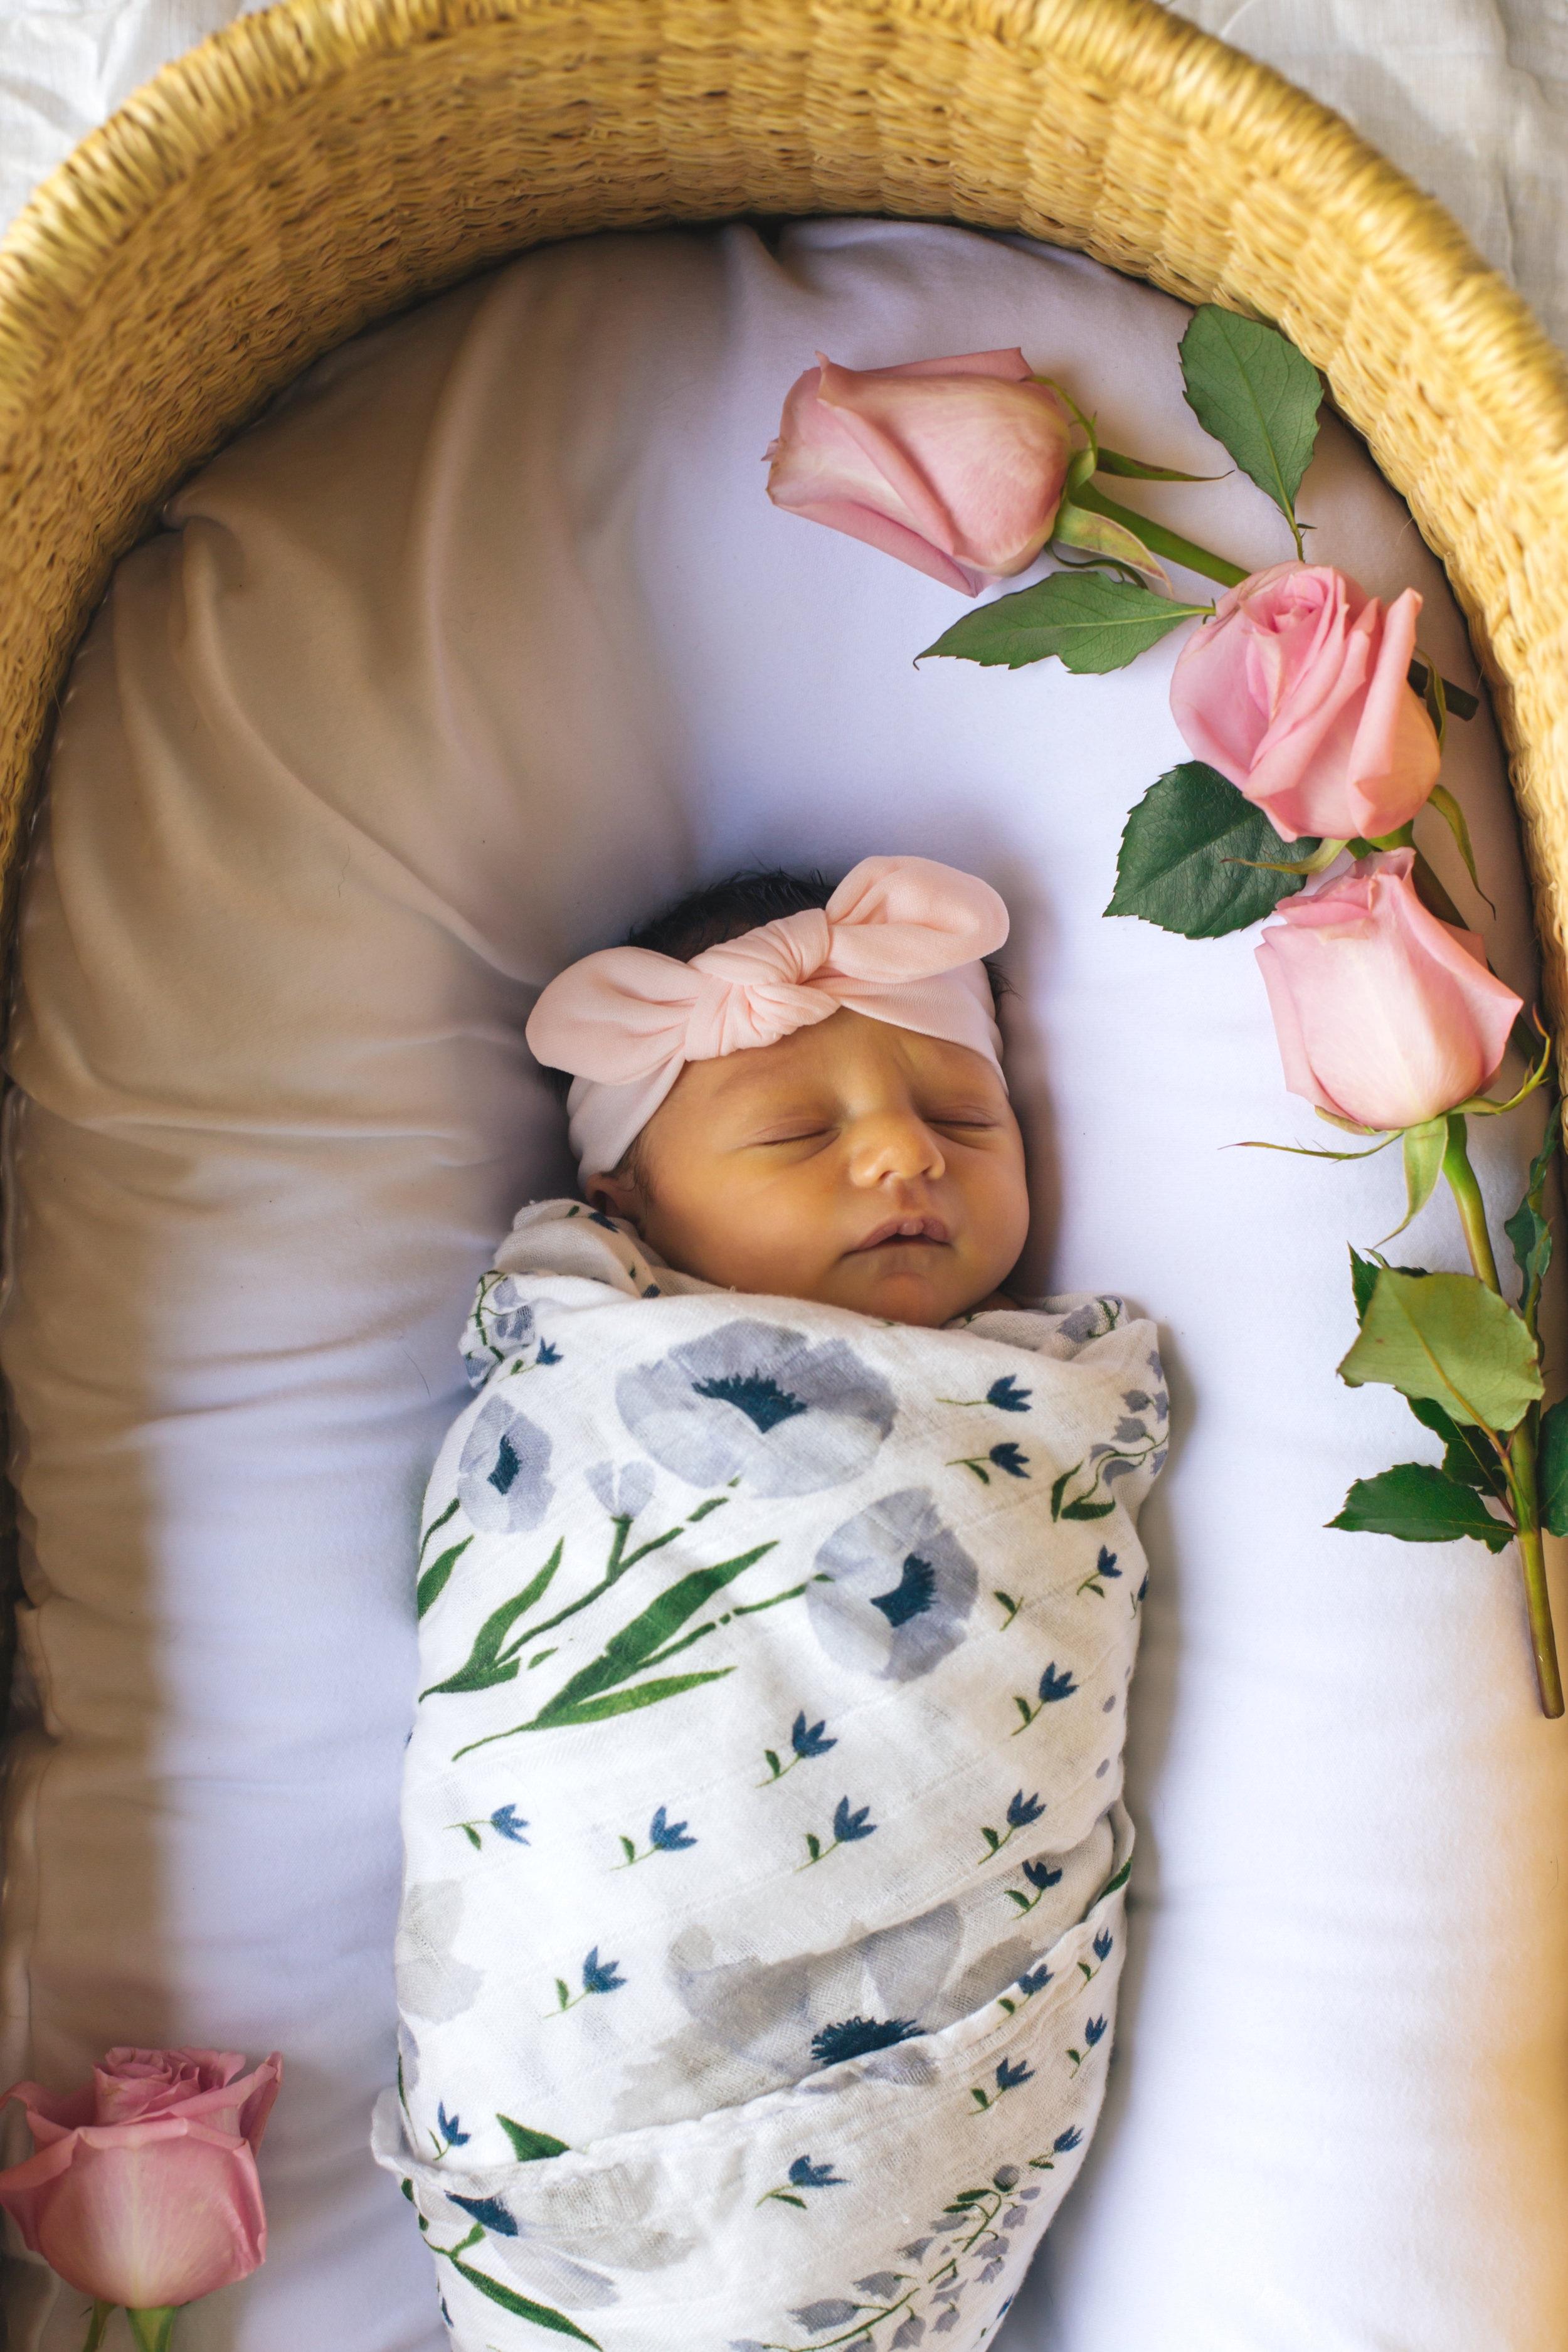 camila_rose_newborn-9.jpg